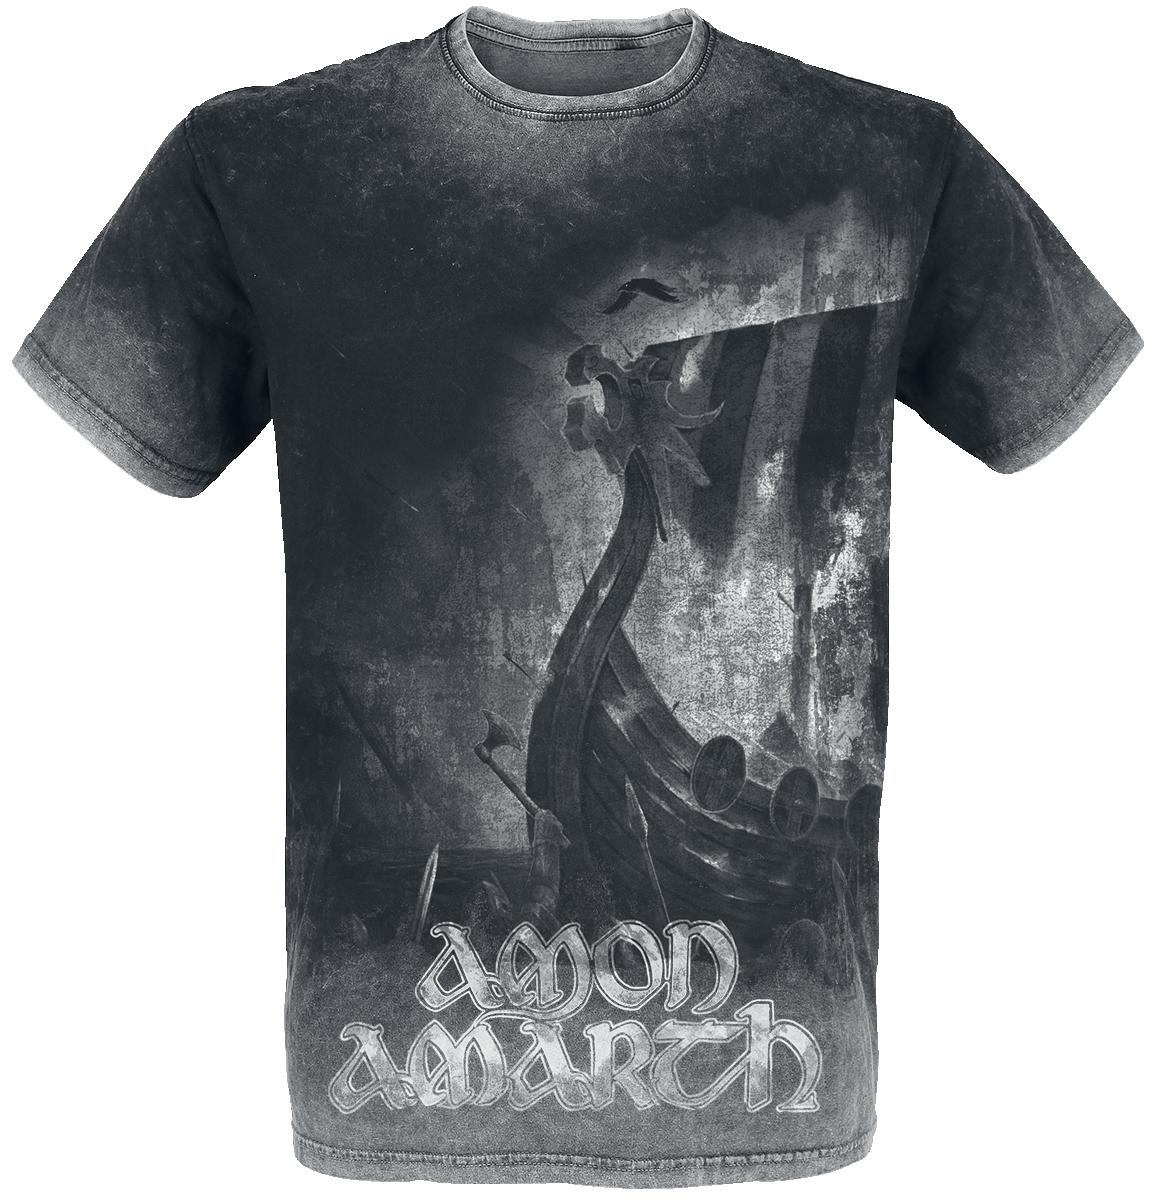 Amon Amarth - One Thousand Burning Arrows - T-Shirt - charcoal image